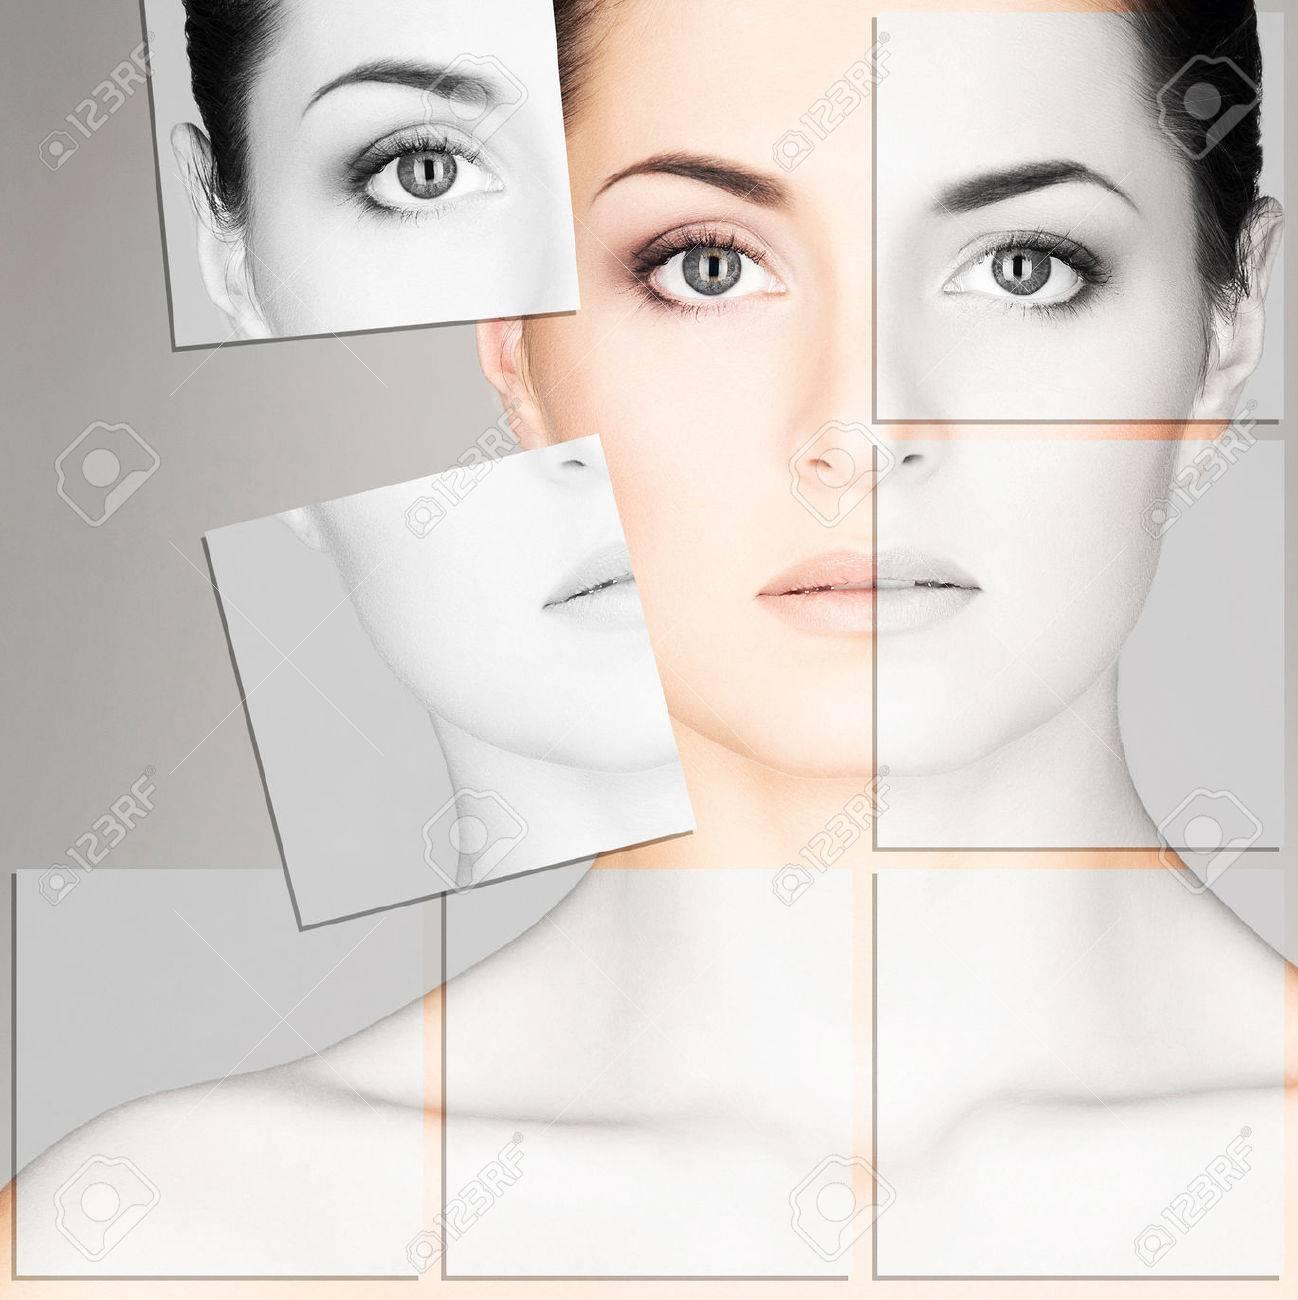 Aesthetic facial mosaic surgery